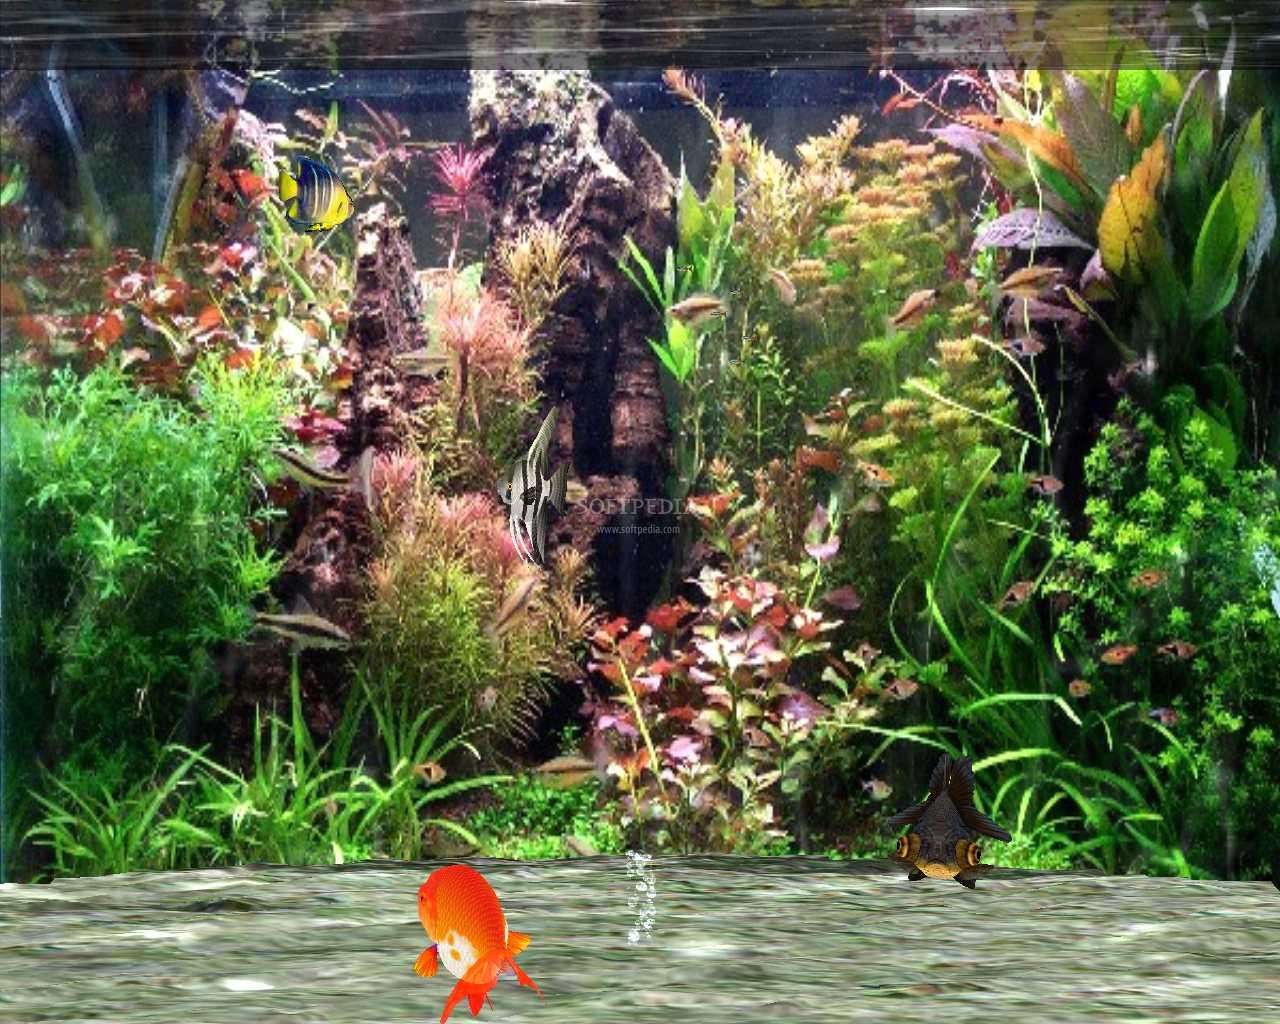 download freeware Screensaver Fantastic 3D Fish Aquarium